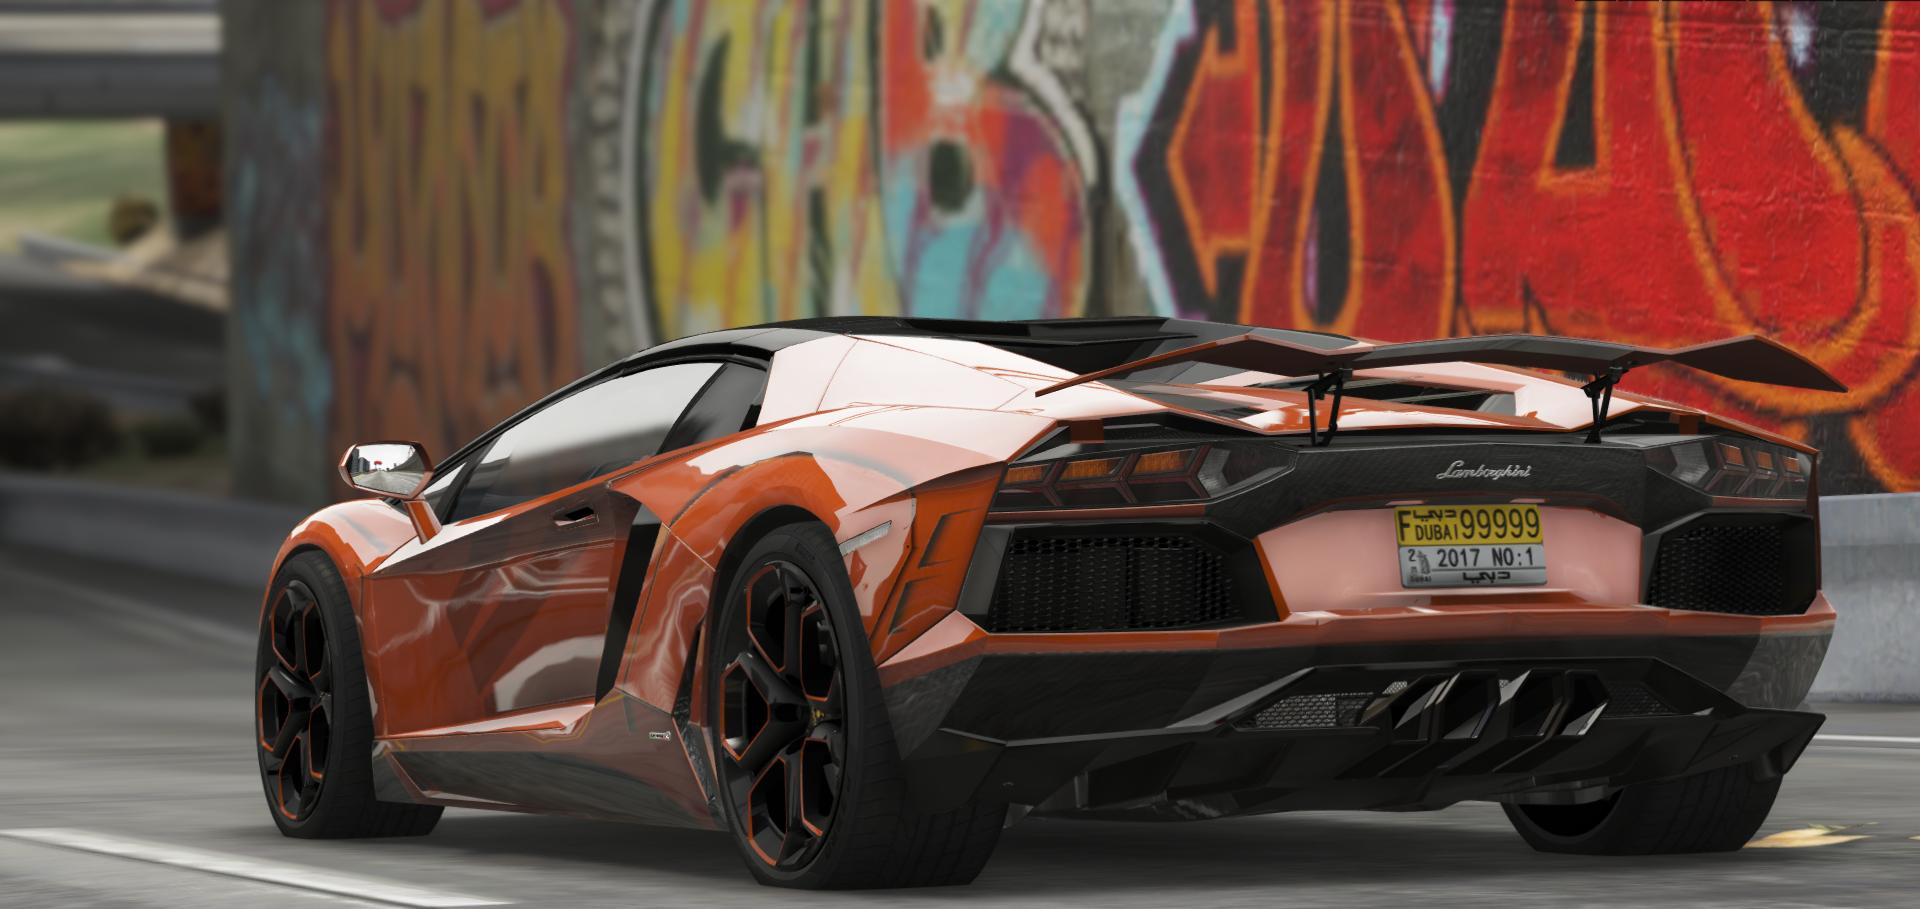 Lamborghini Lp700r Uniform Reference From Fh3 Gta5 Mods Com